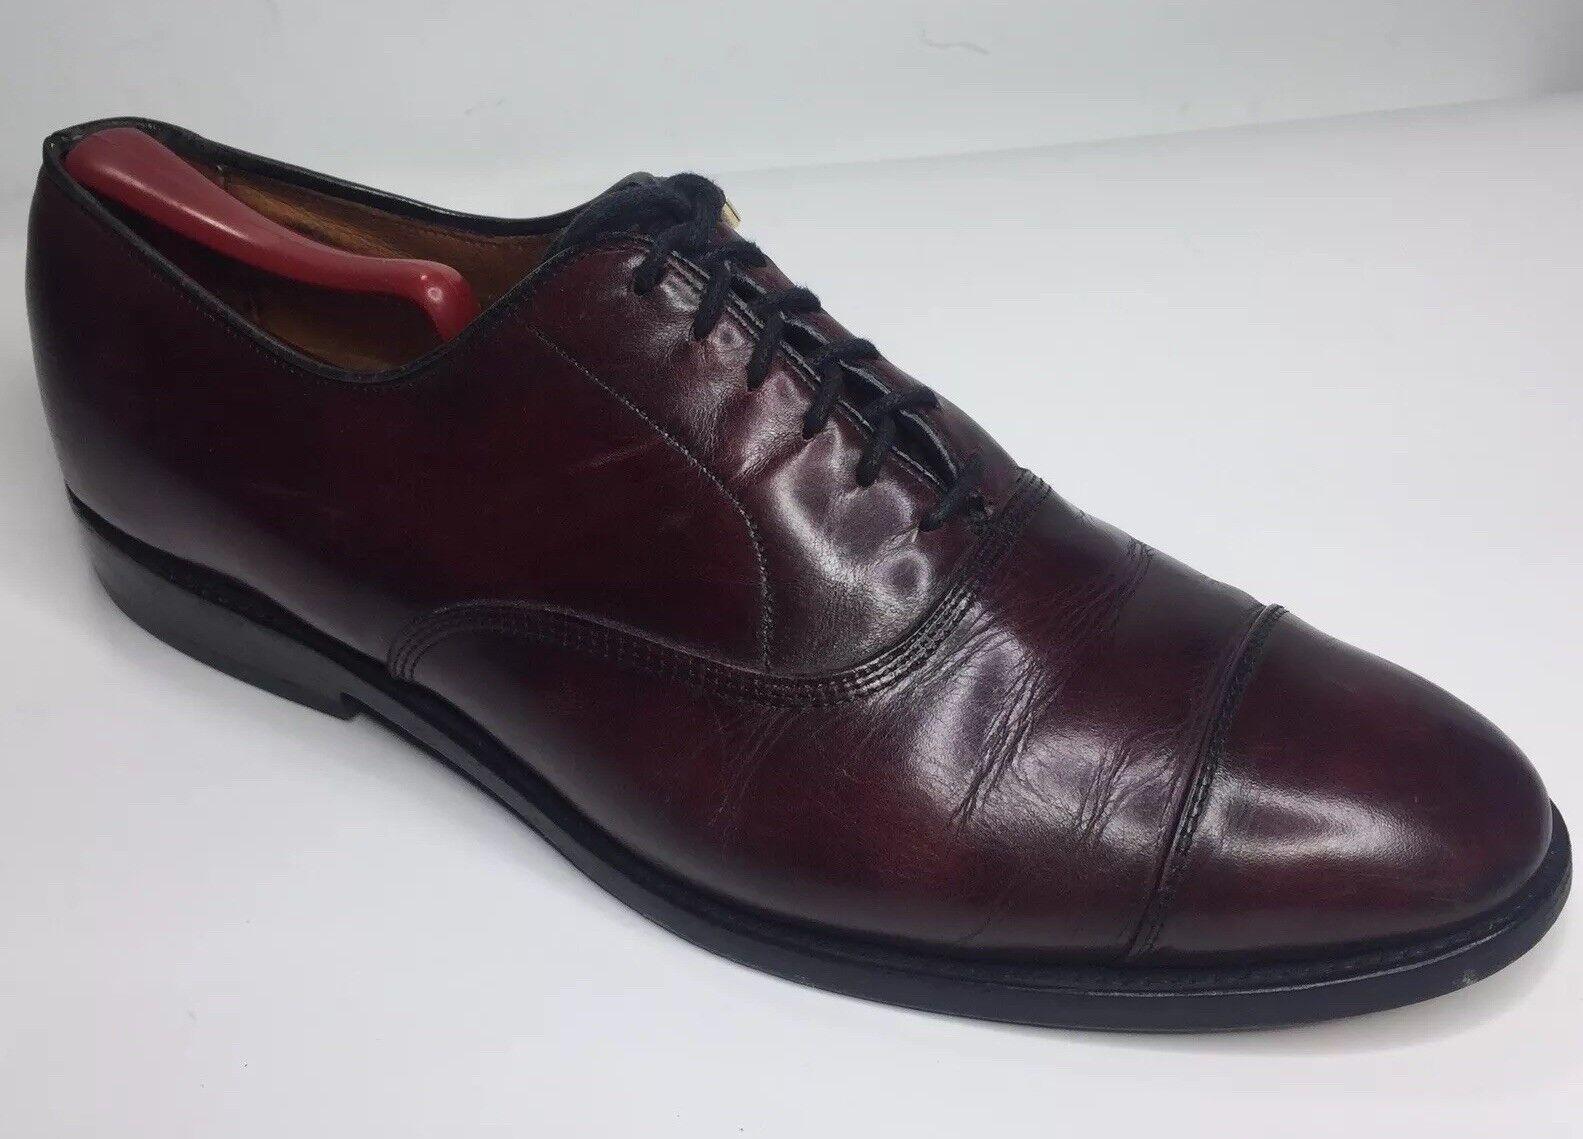 popolare Allen Edmonds Park Avenue 5875 Burgundy Captoe Captoe Captoe Oxford Dress scarpe Uomo 10.5 D  rivenditori online